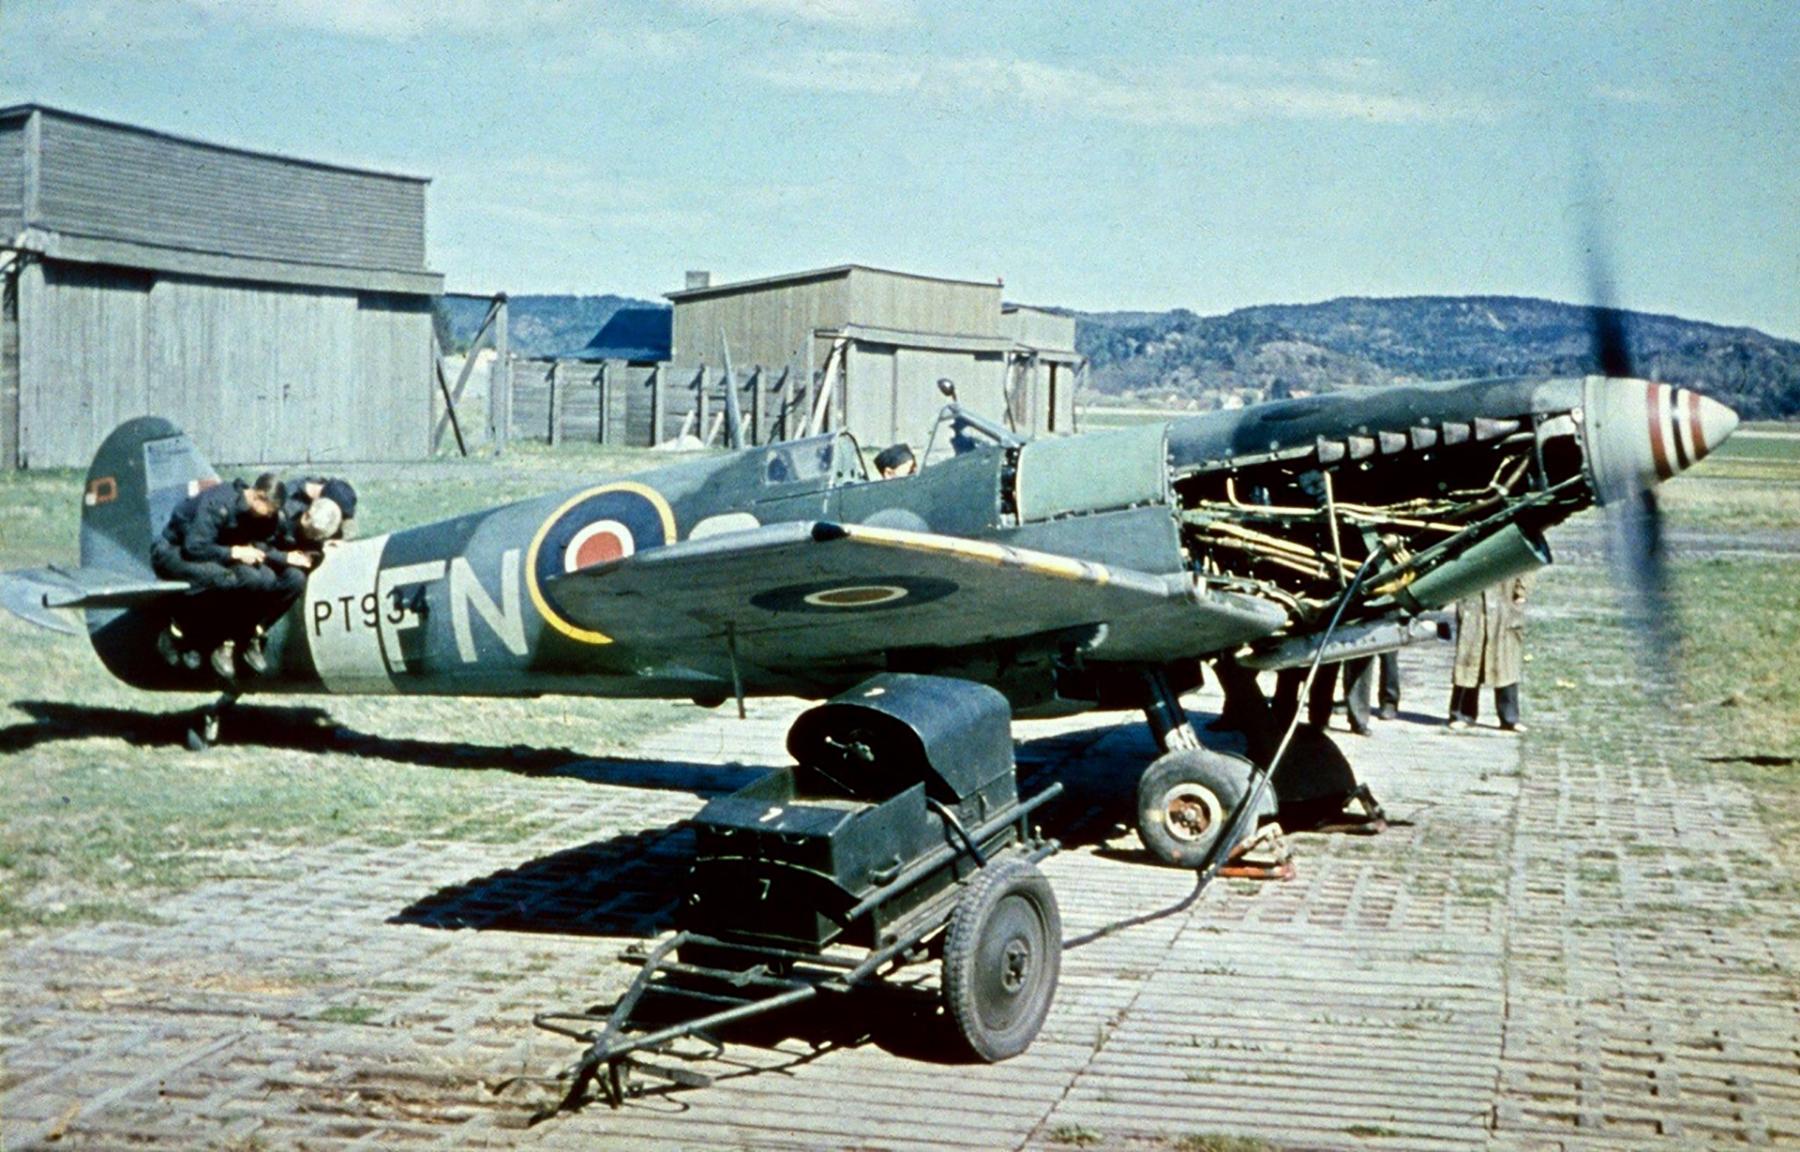 Spitfire LFIX RAF 331Sqn FN PT934 1946 01